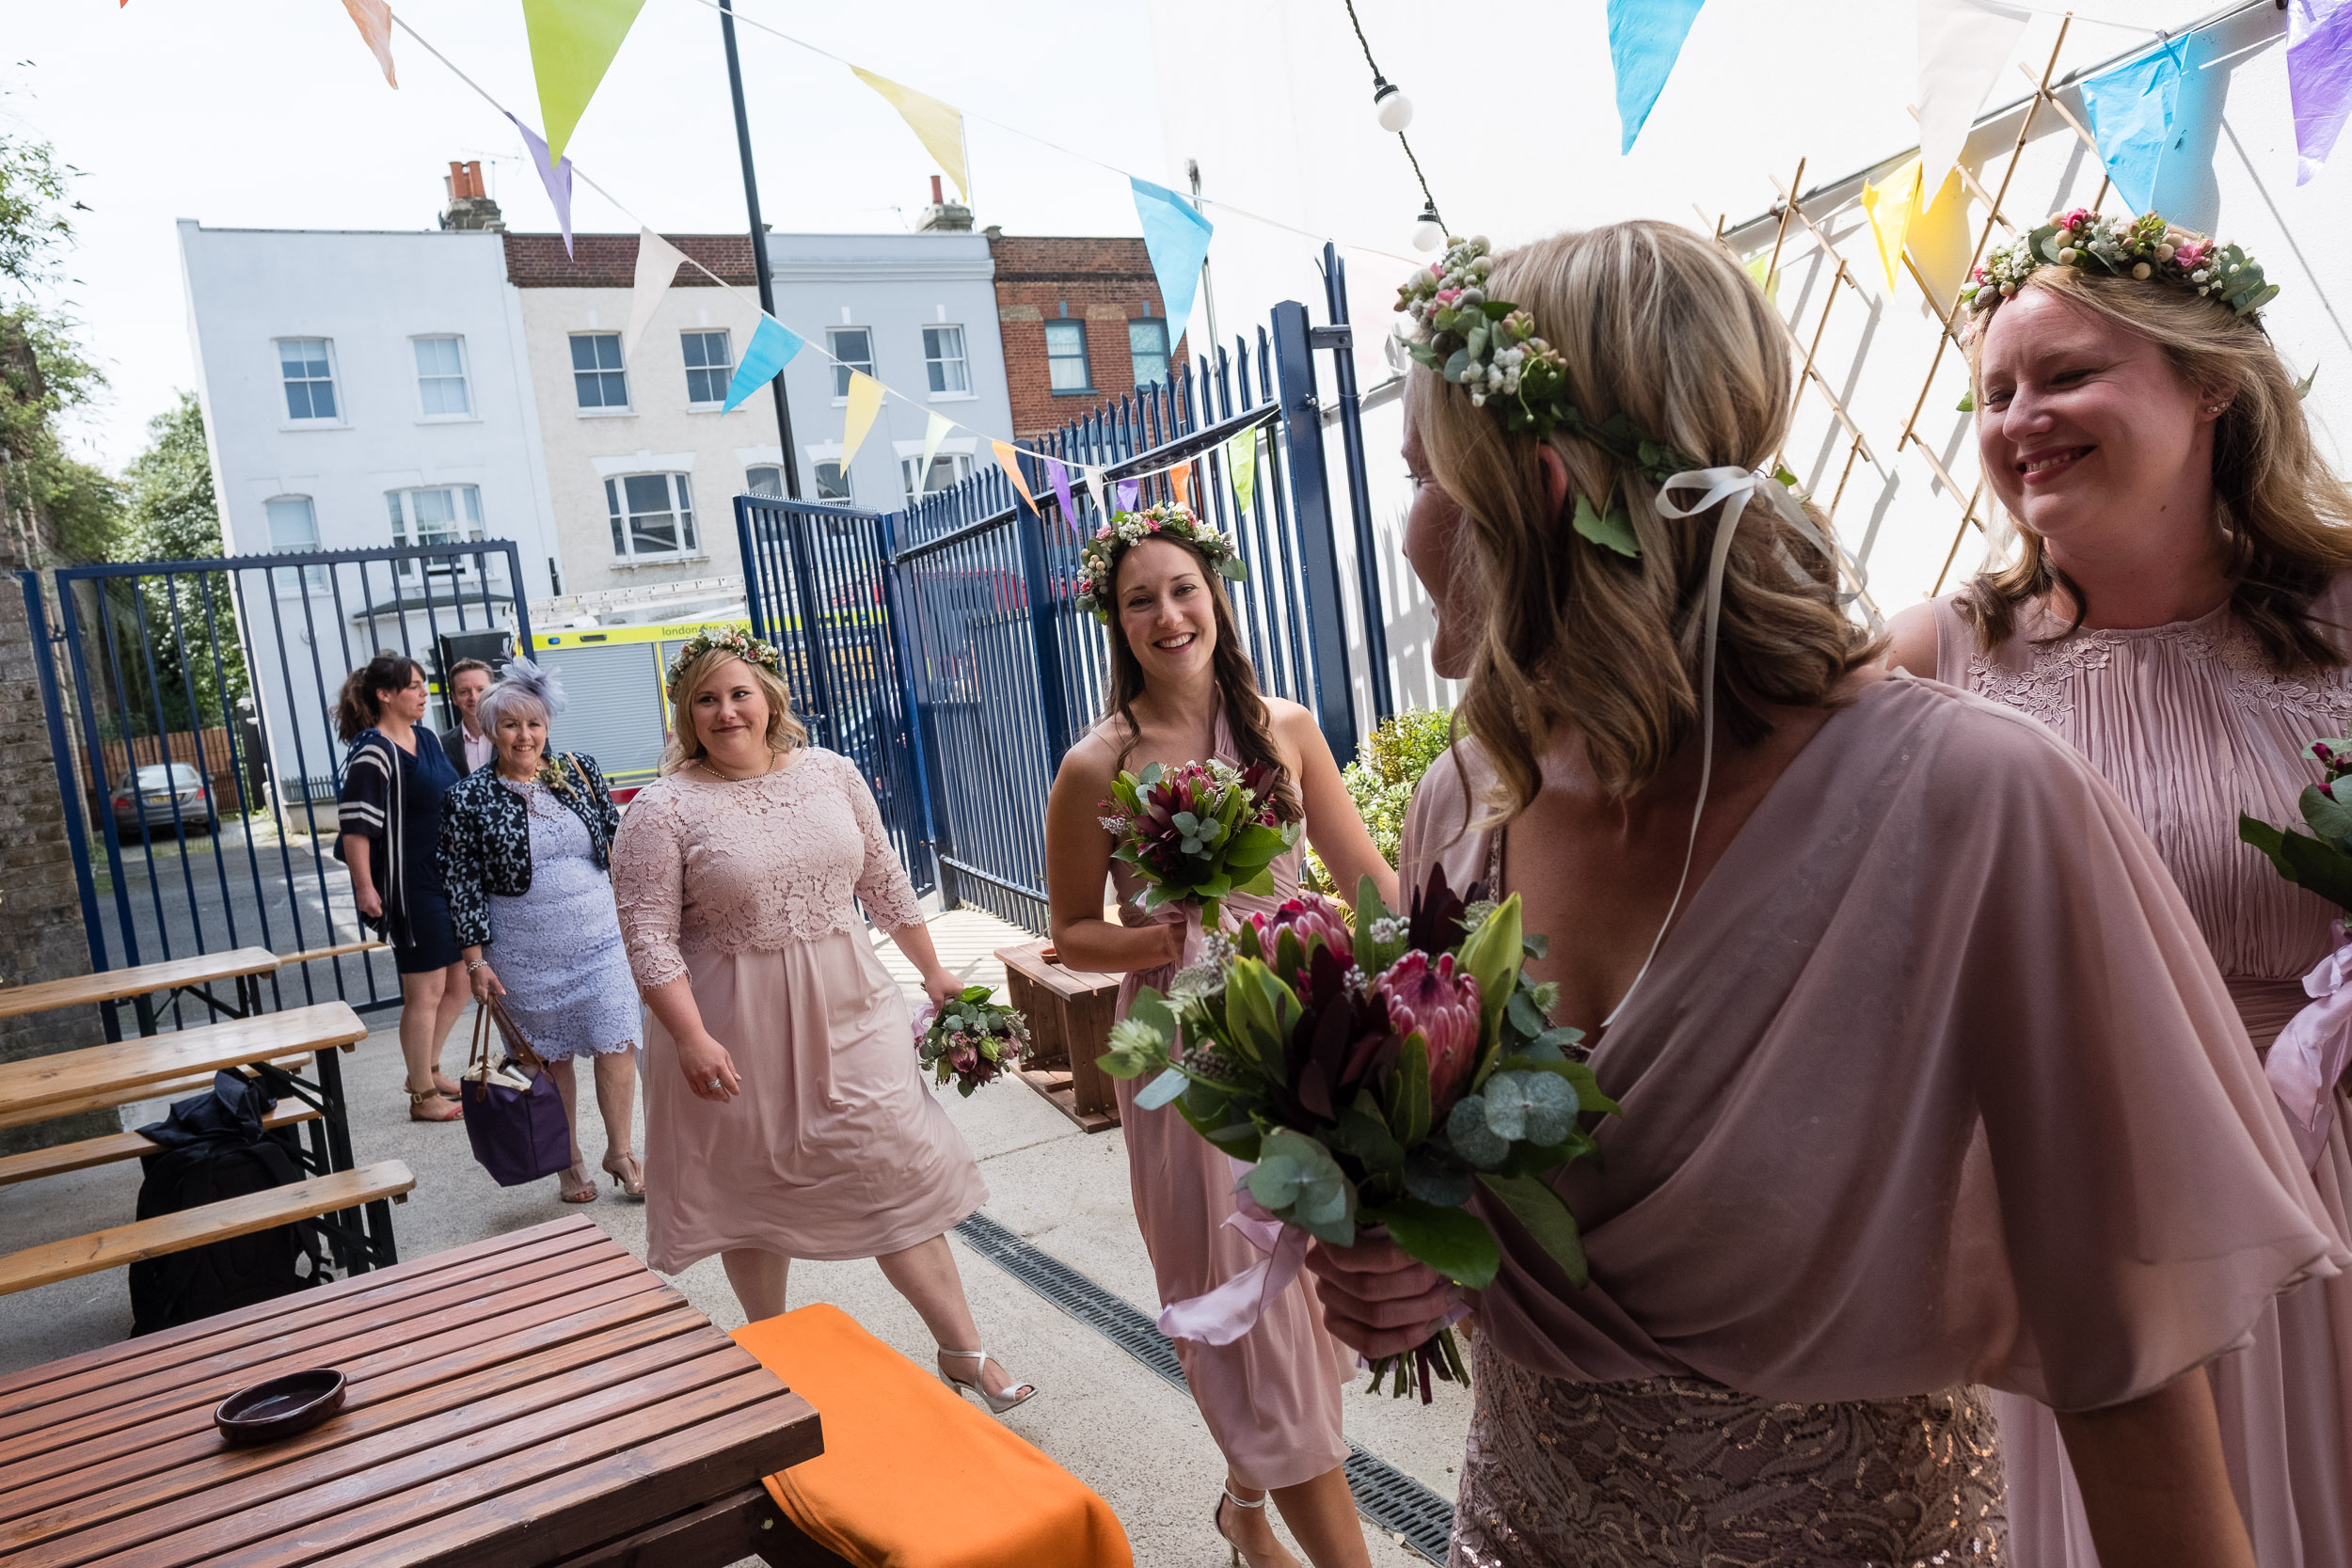 brockwell-lido-brixton-herne-hill-wedding-038.jpg